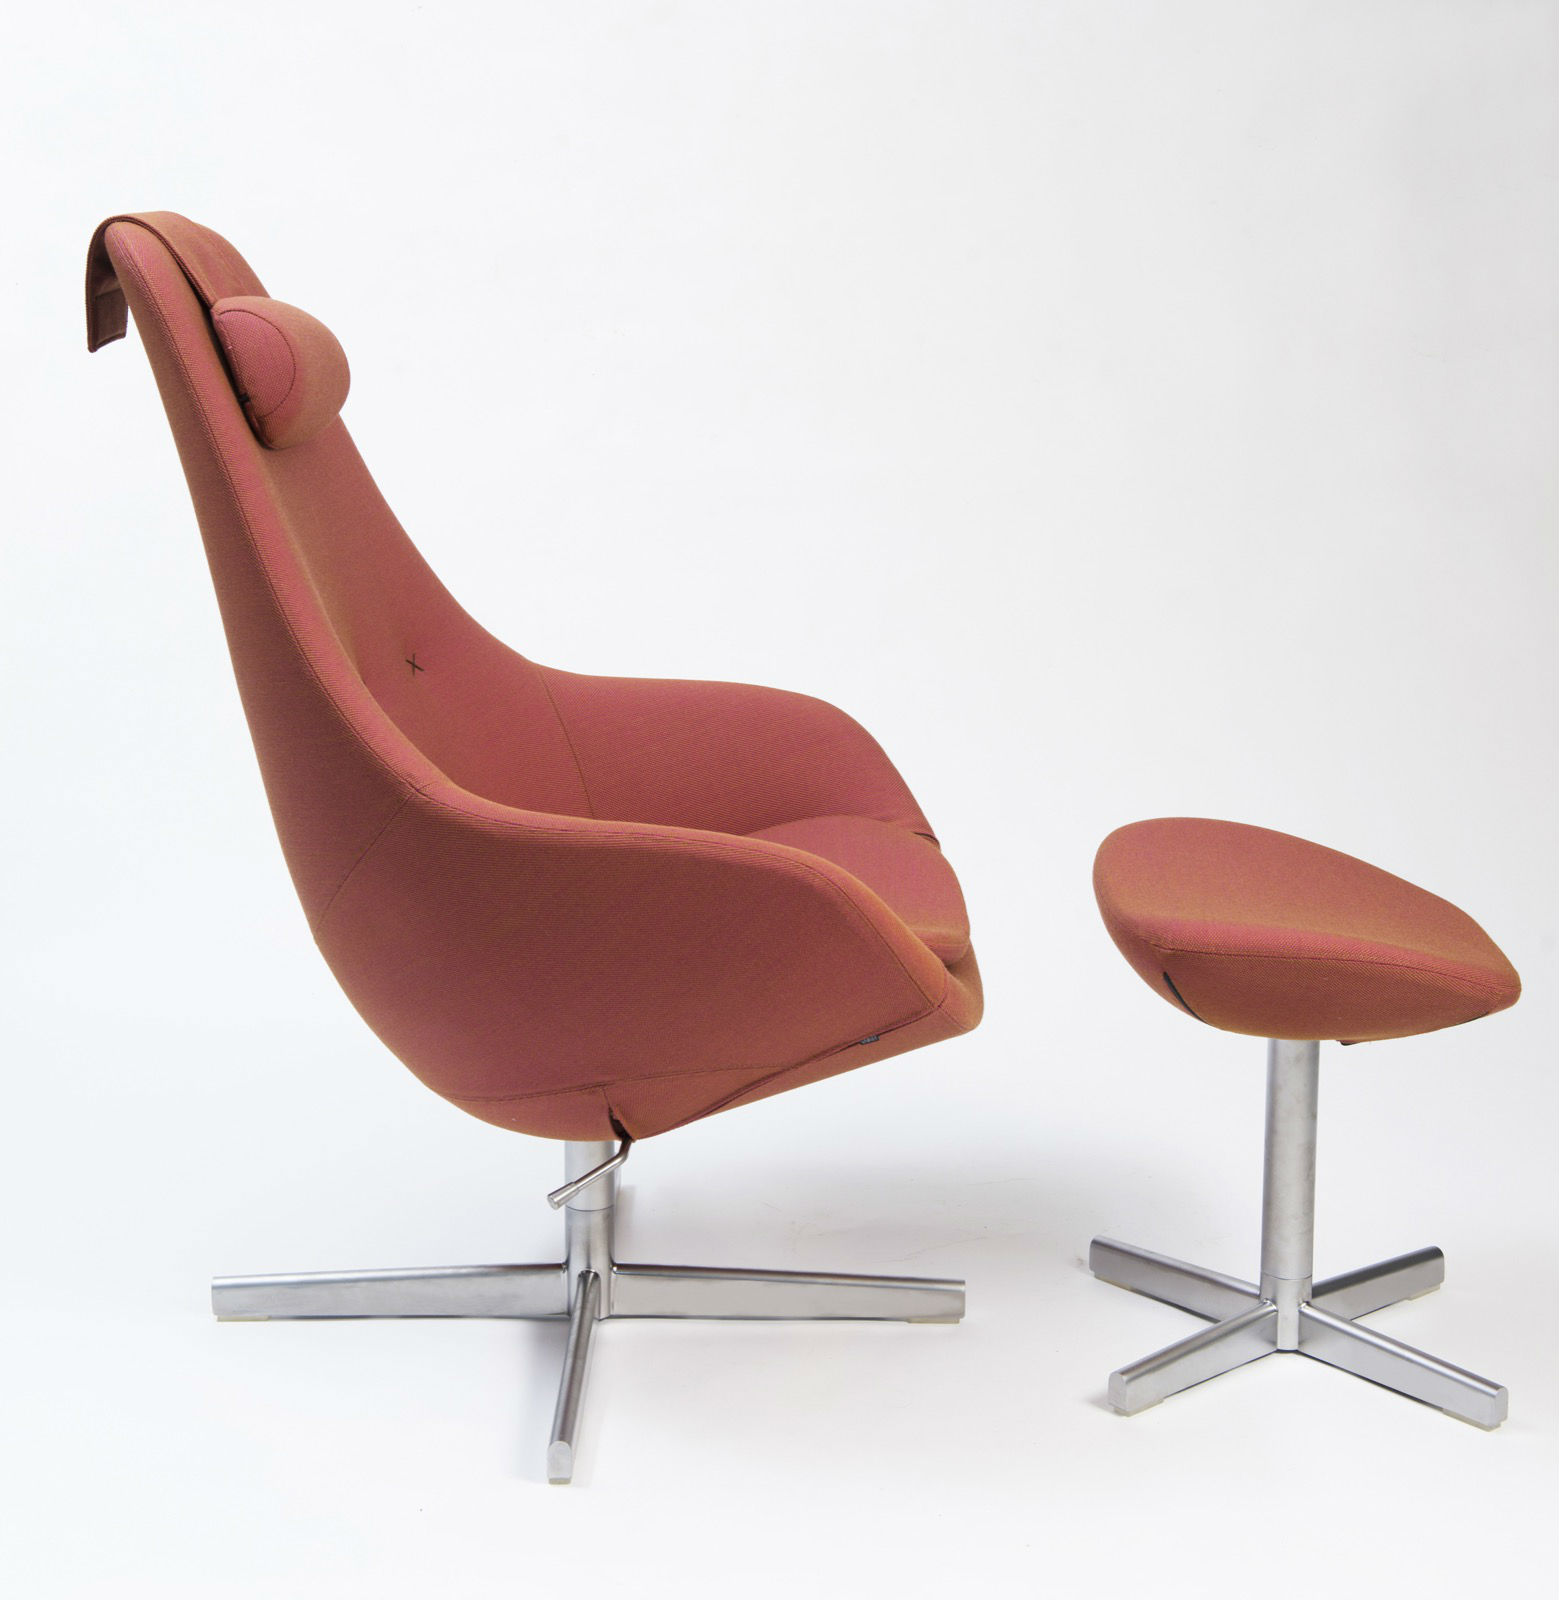 vari r kokon fauteuil matser wageningen. Black Bedroom Furniture Sets. Home Design Ideas